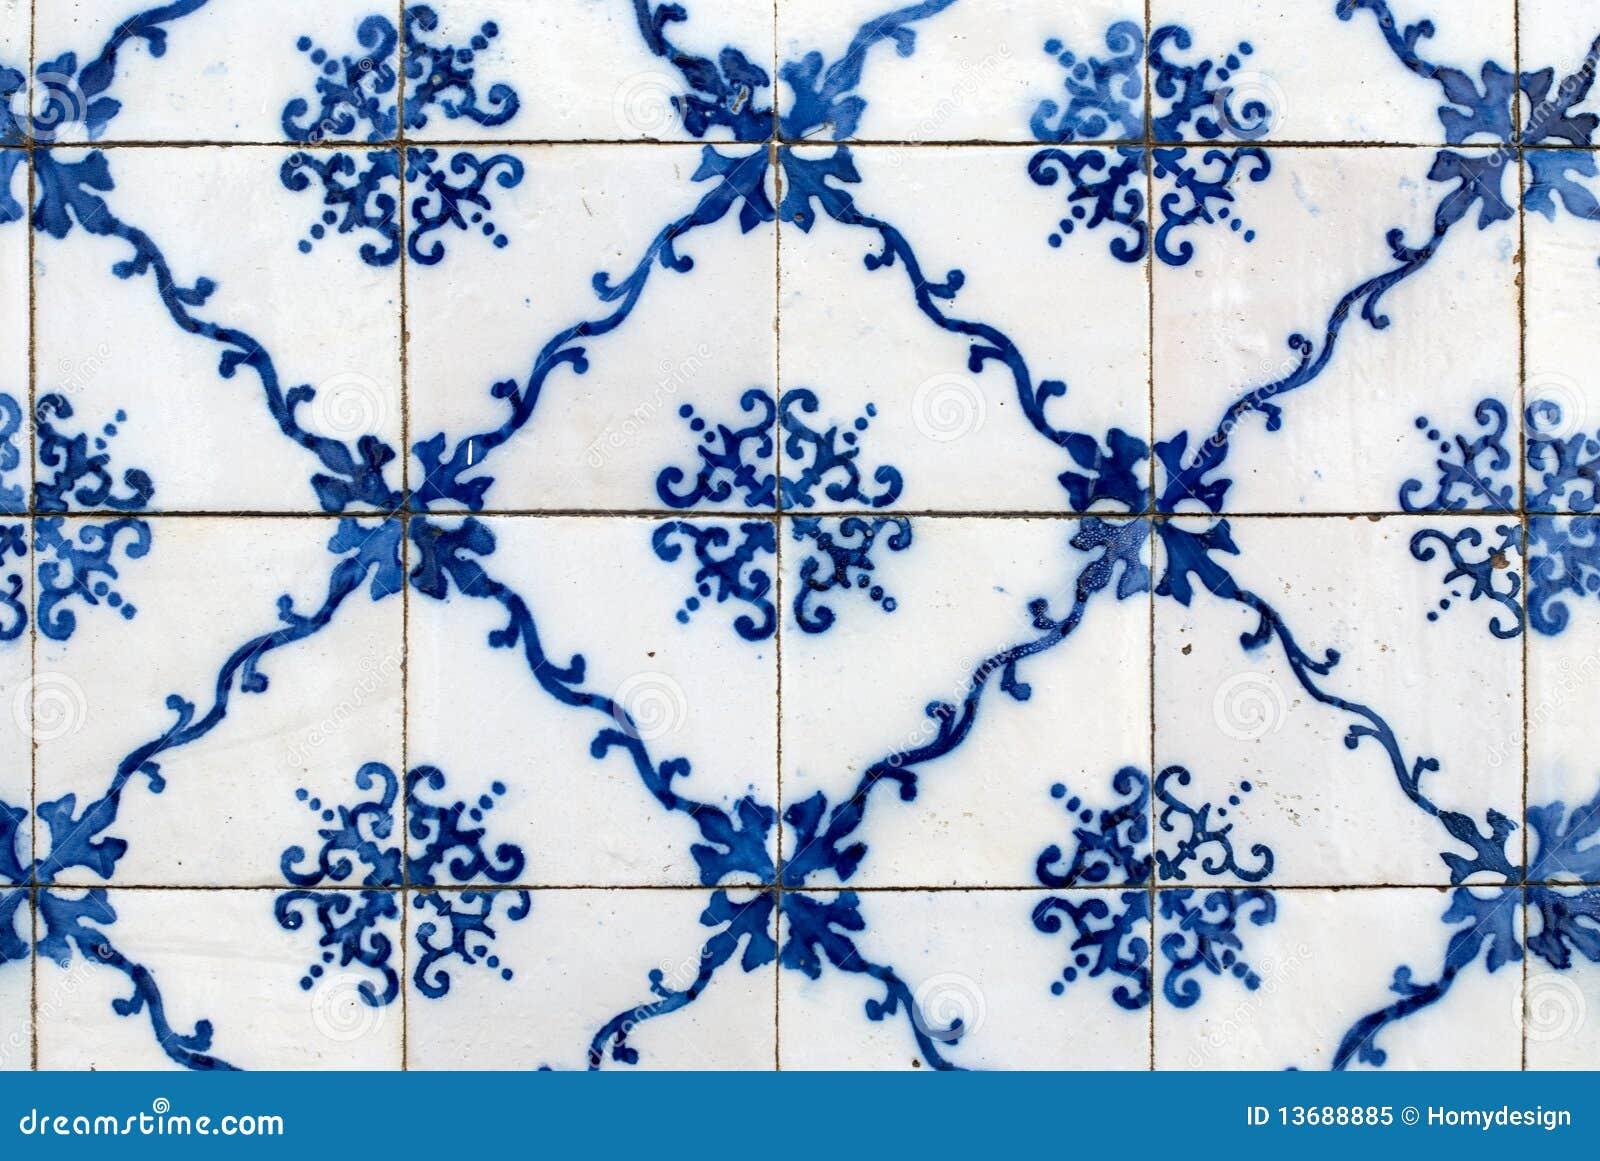 Tuiles glacées portugaises 037